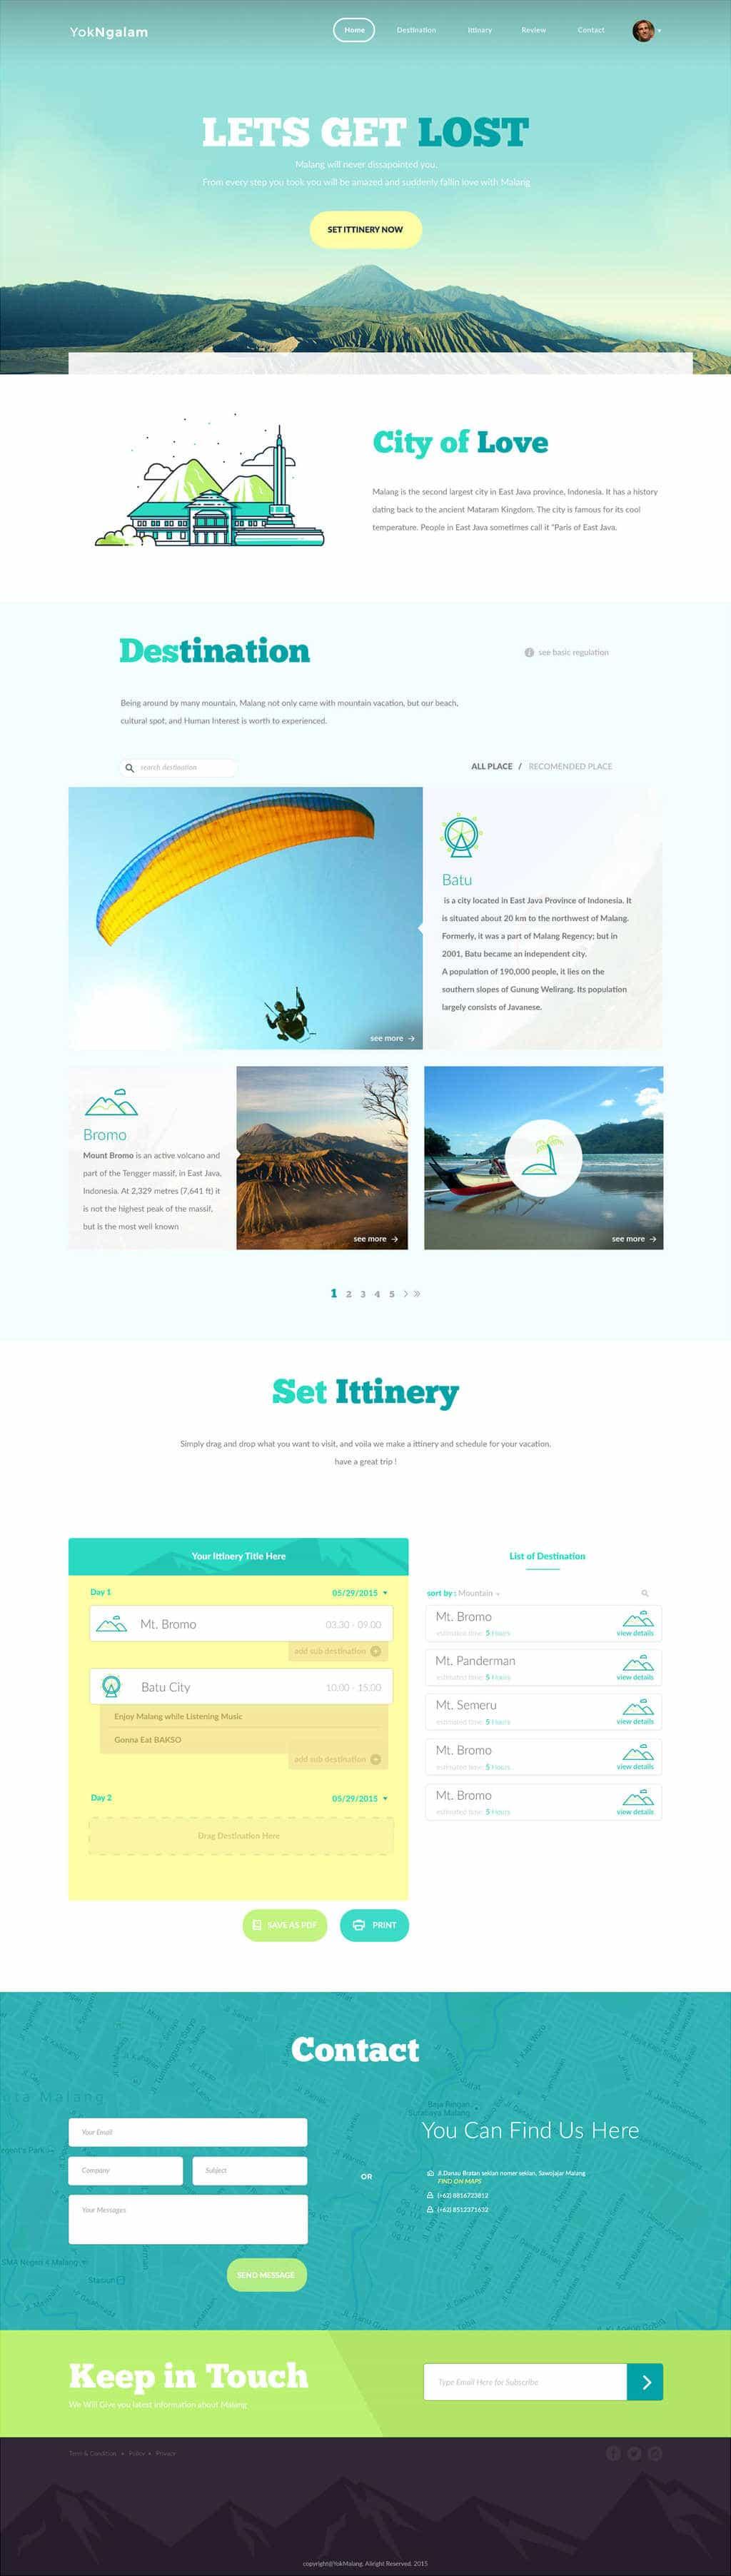 Daily Freebie: Flat Design Travel Tour Template (PSD)